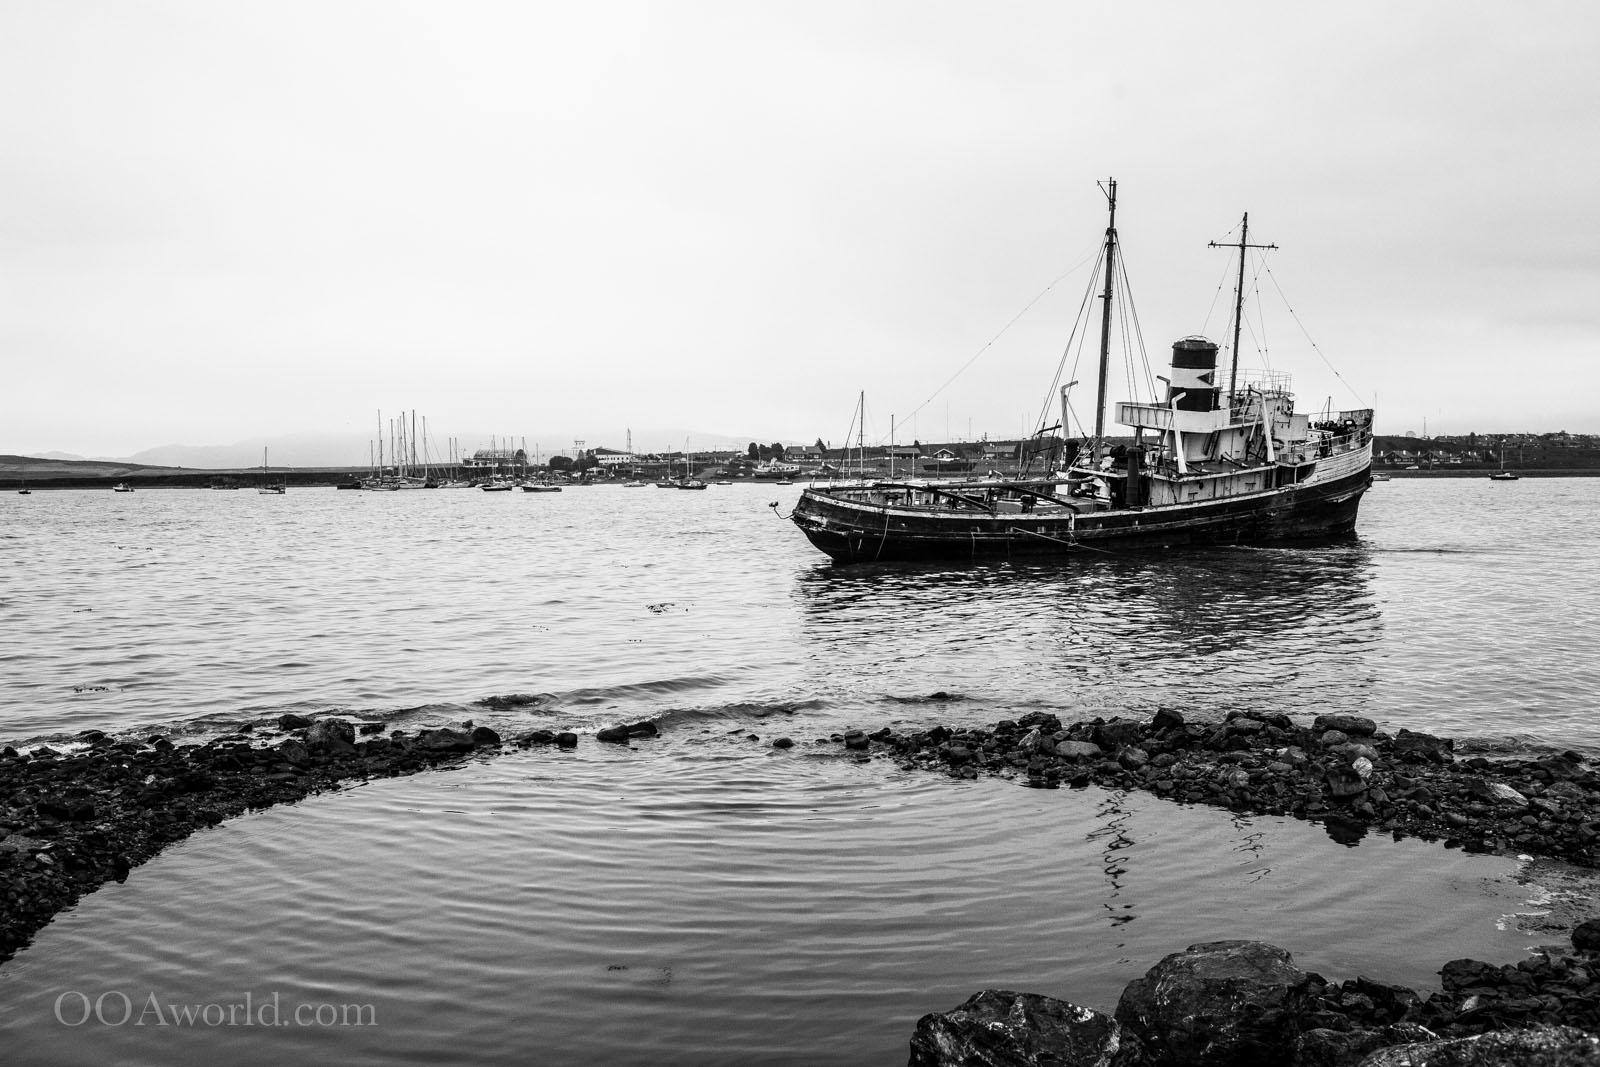 Ushuaia Sunken Ship Photo Ooaworld